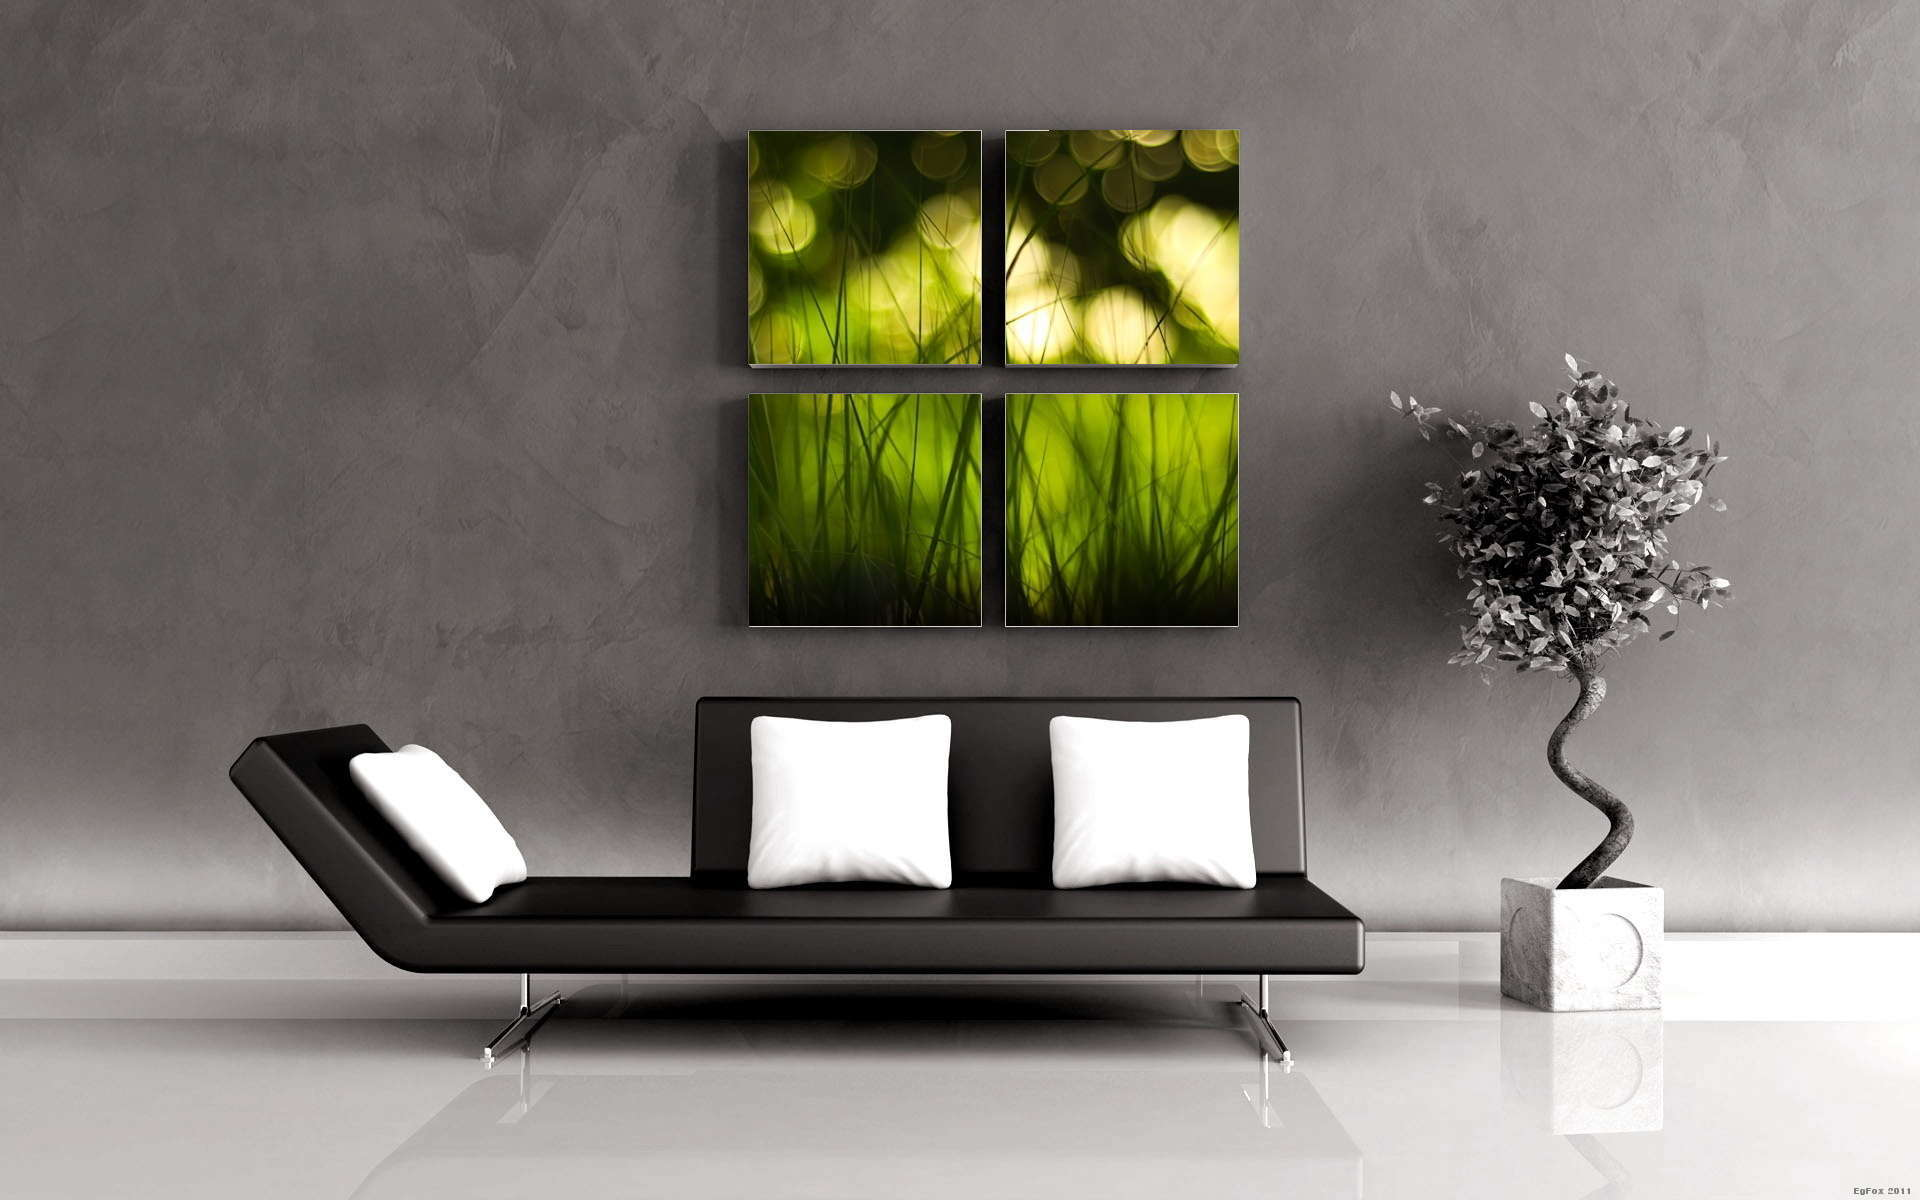 Furniture-Artistic-Room-Wallpaper-HD